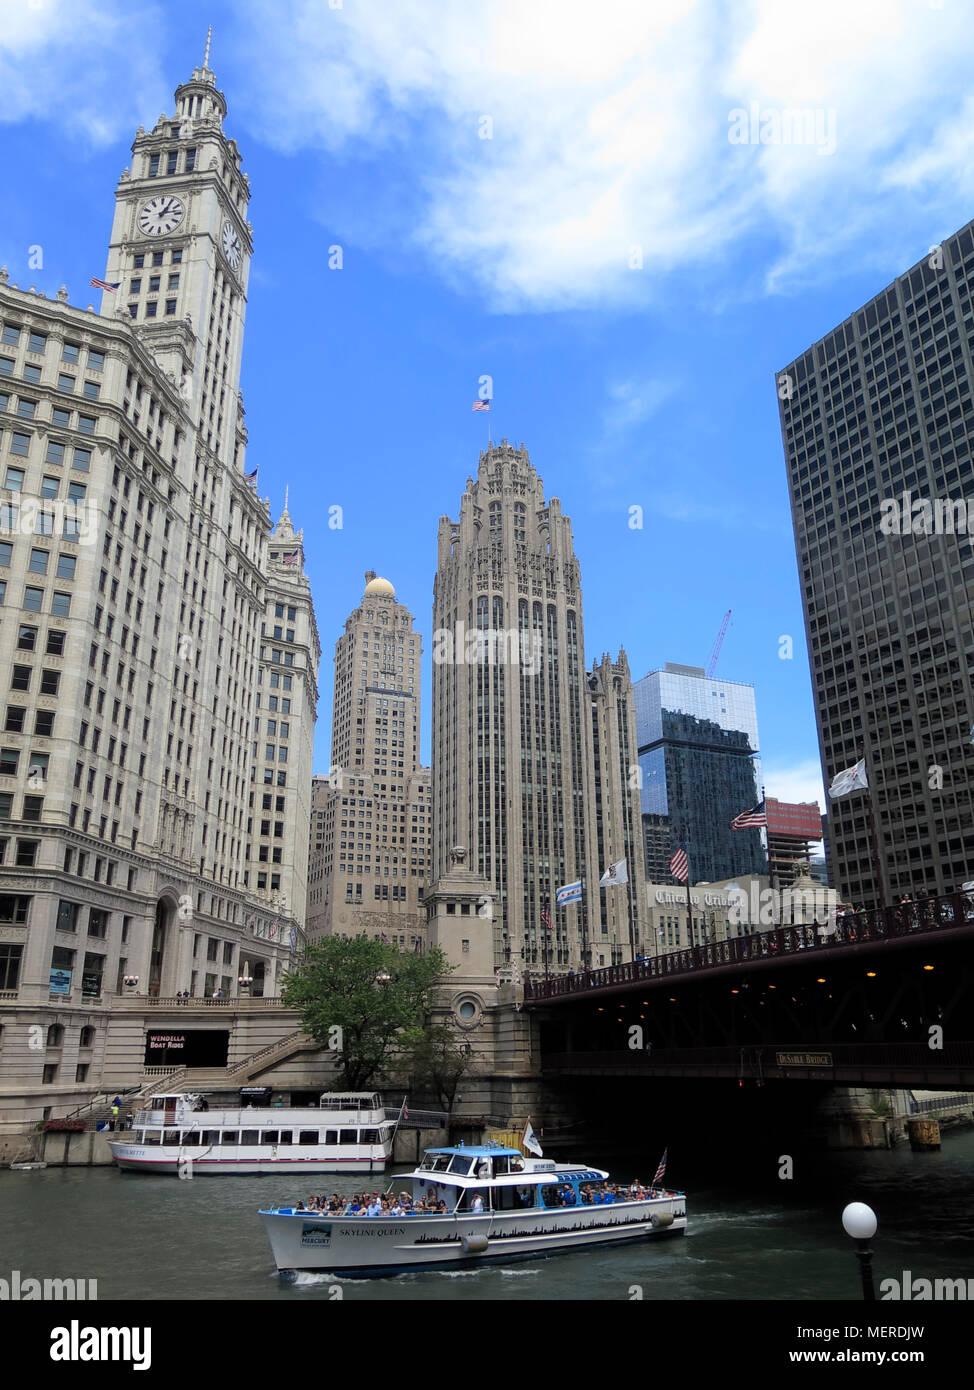 Tribune Tower  at Du Sable Bridge, Chicago river,Chicago, Illinois, USA - Stock Image